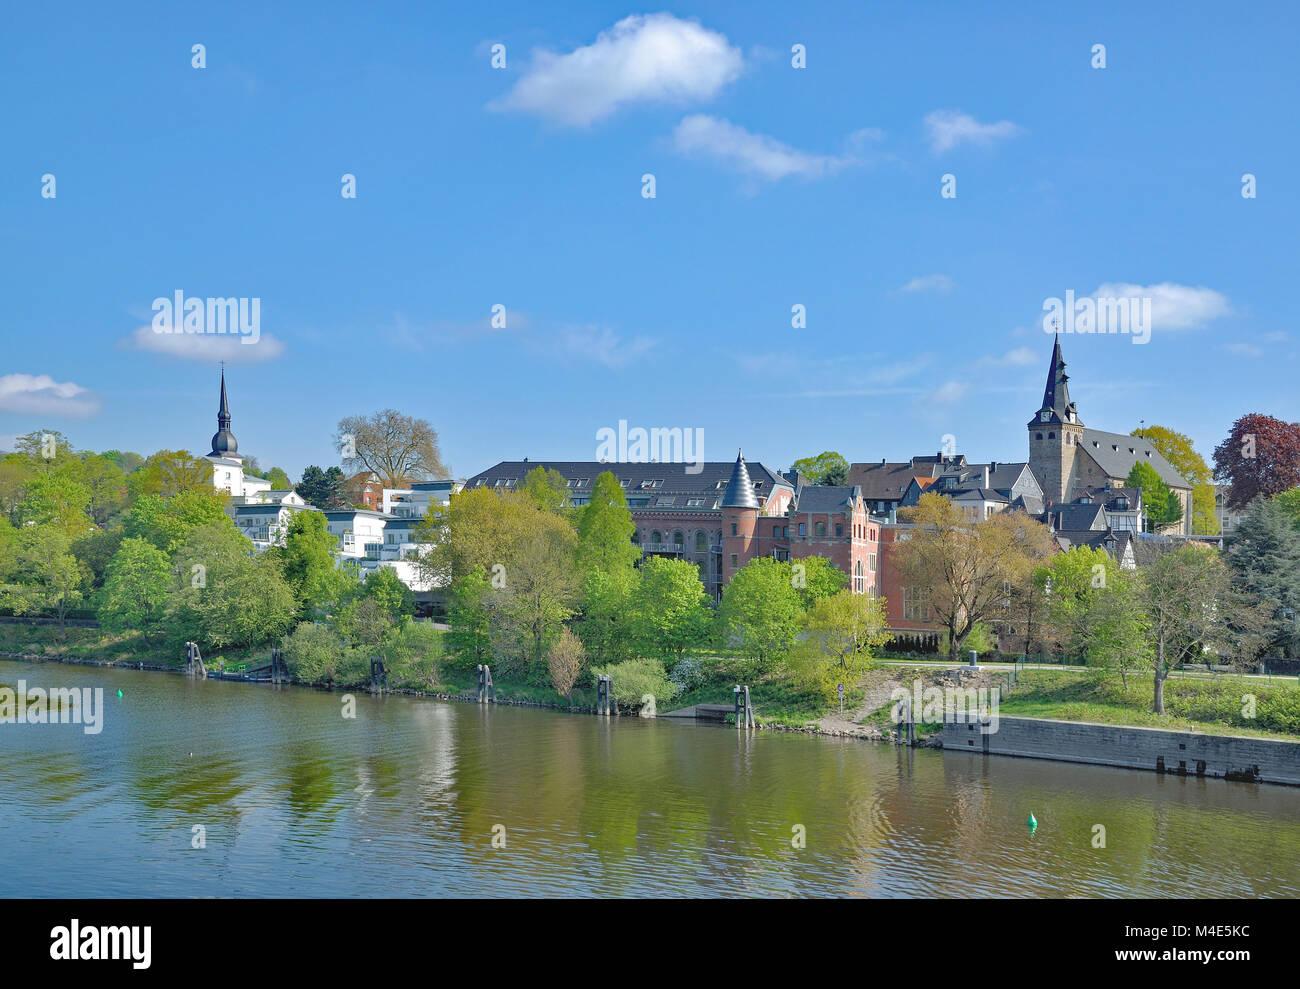 Kettwig at River Ruhr,Ruhr region,North Rhine Westphalia,Germany - Stock Image